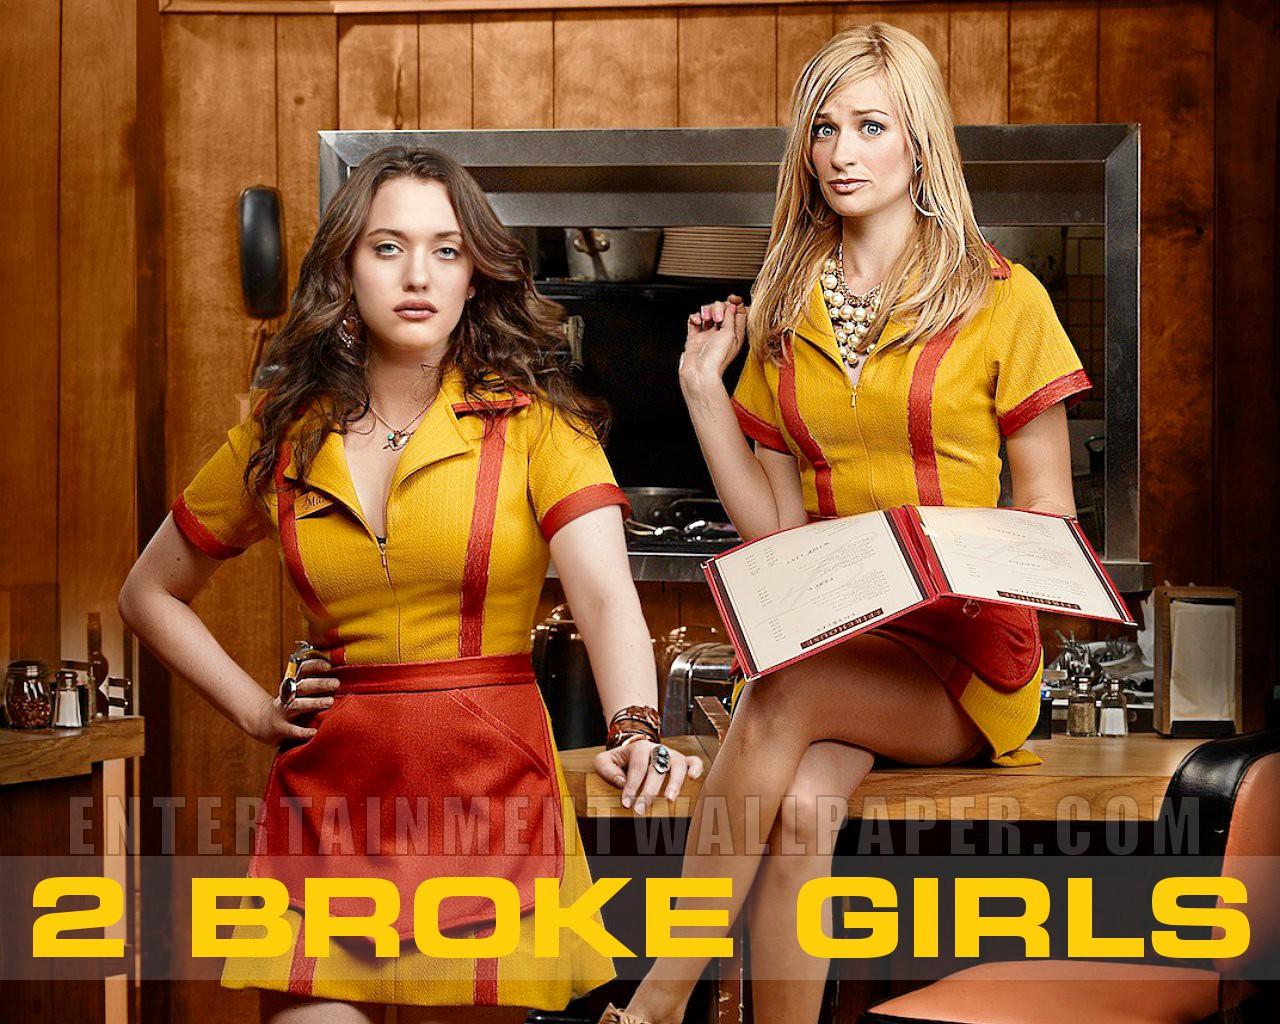 tv-2-broke-girls03.jpg